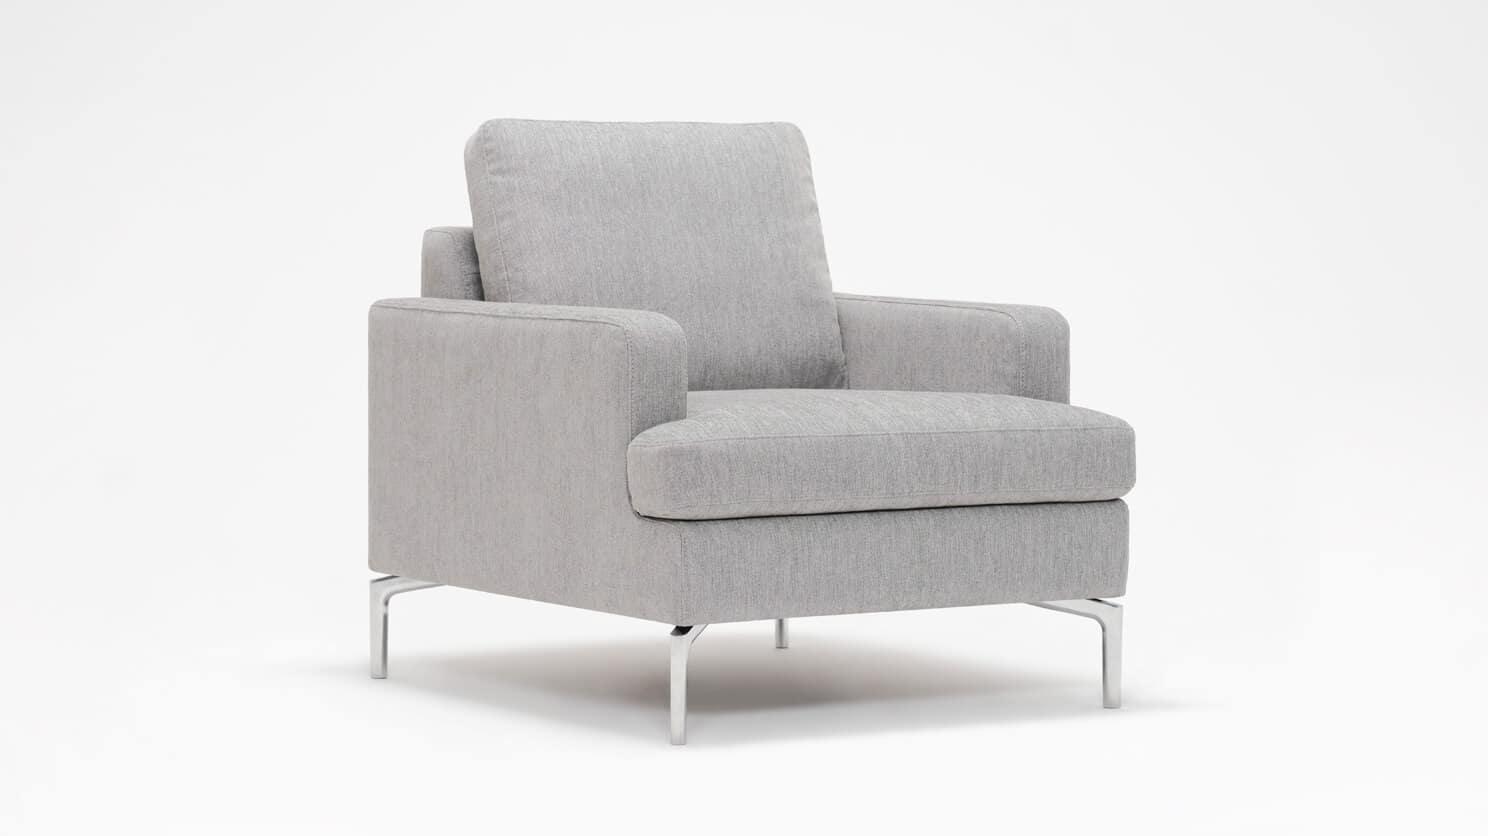 31127 02 2 chairs eve chair coda concrete corner 01